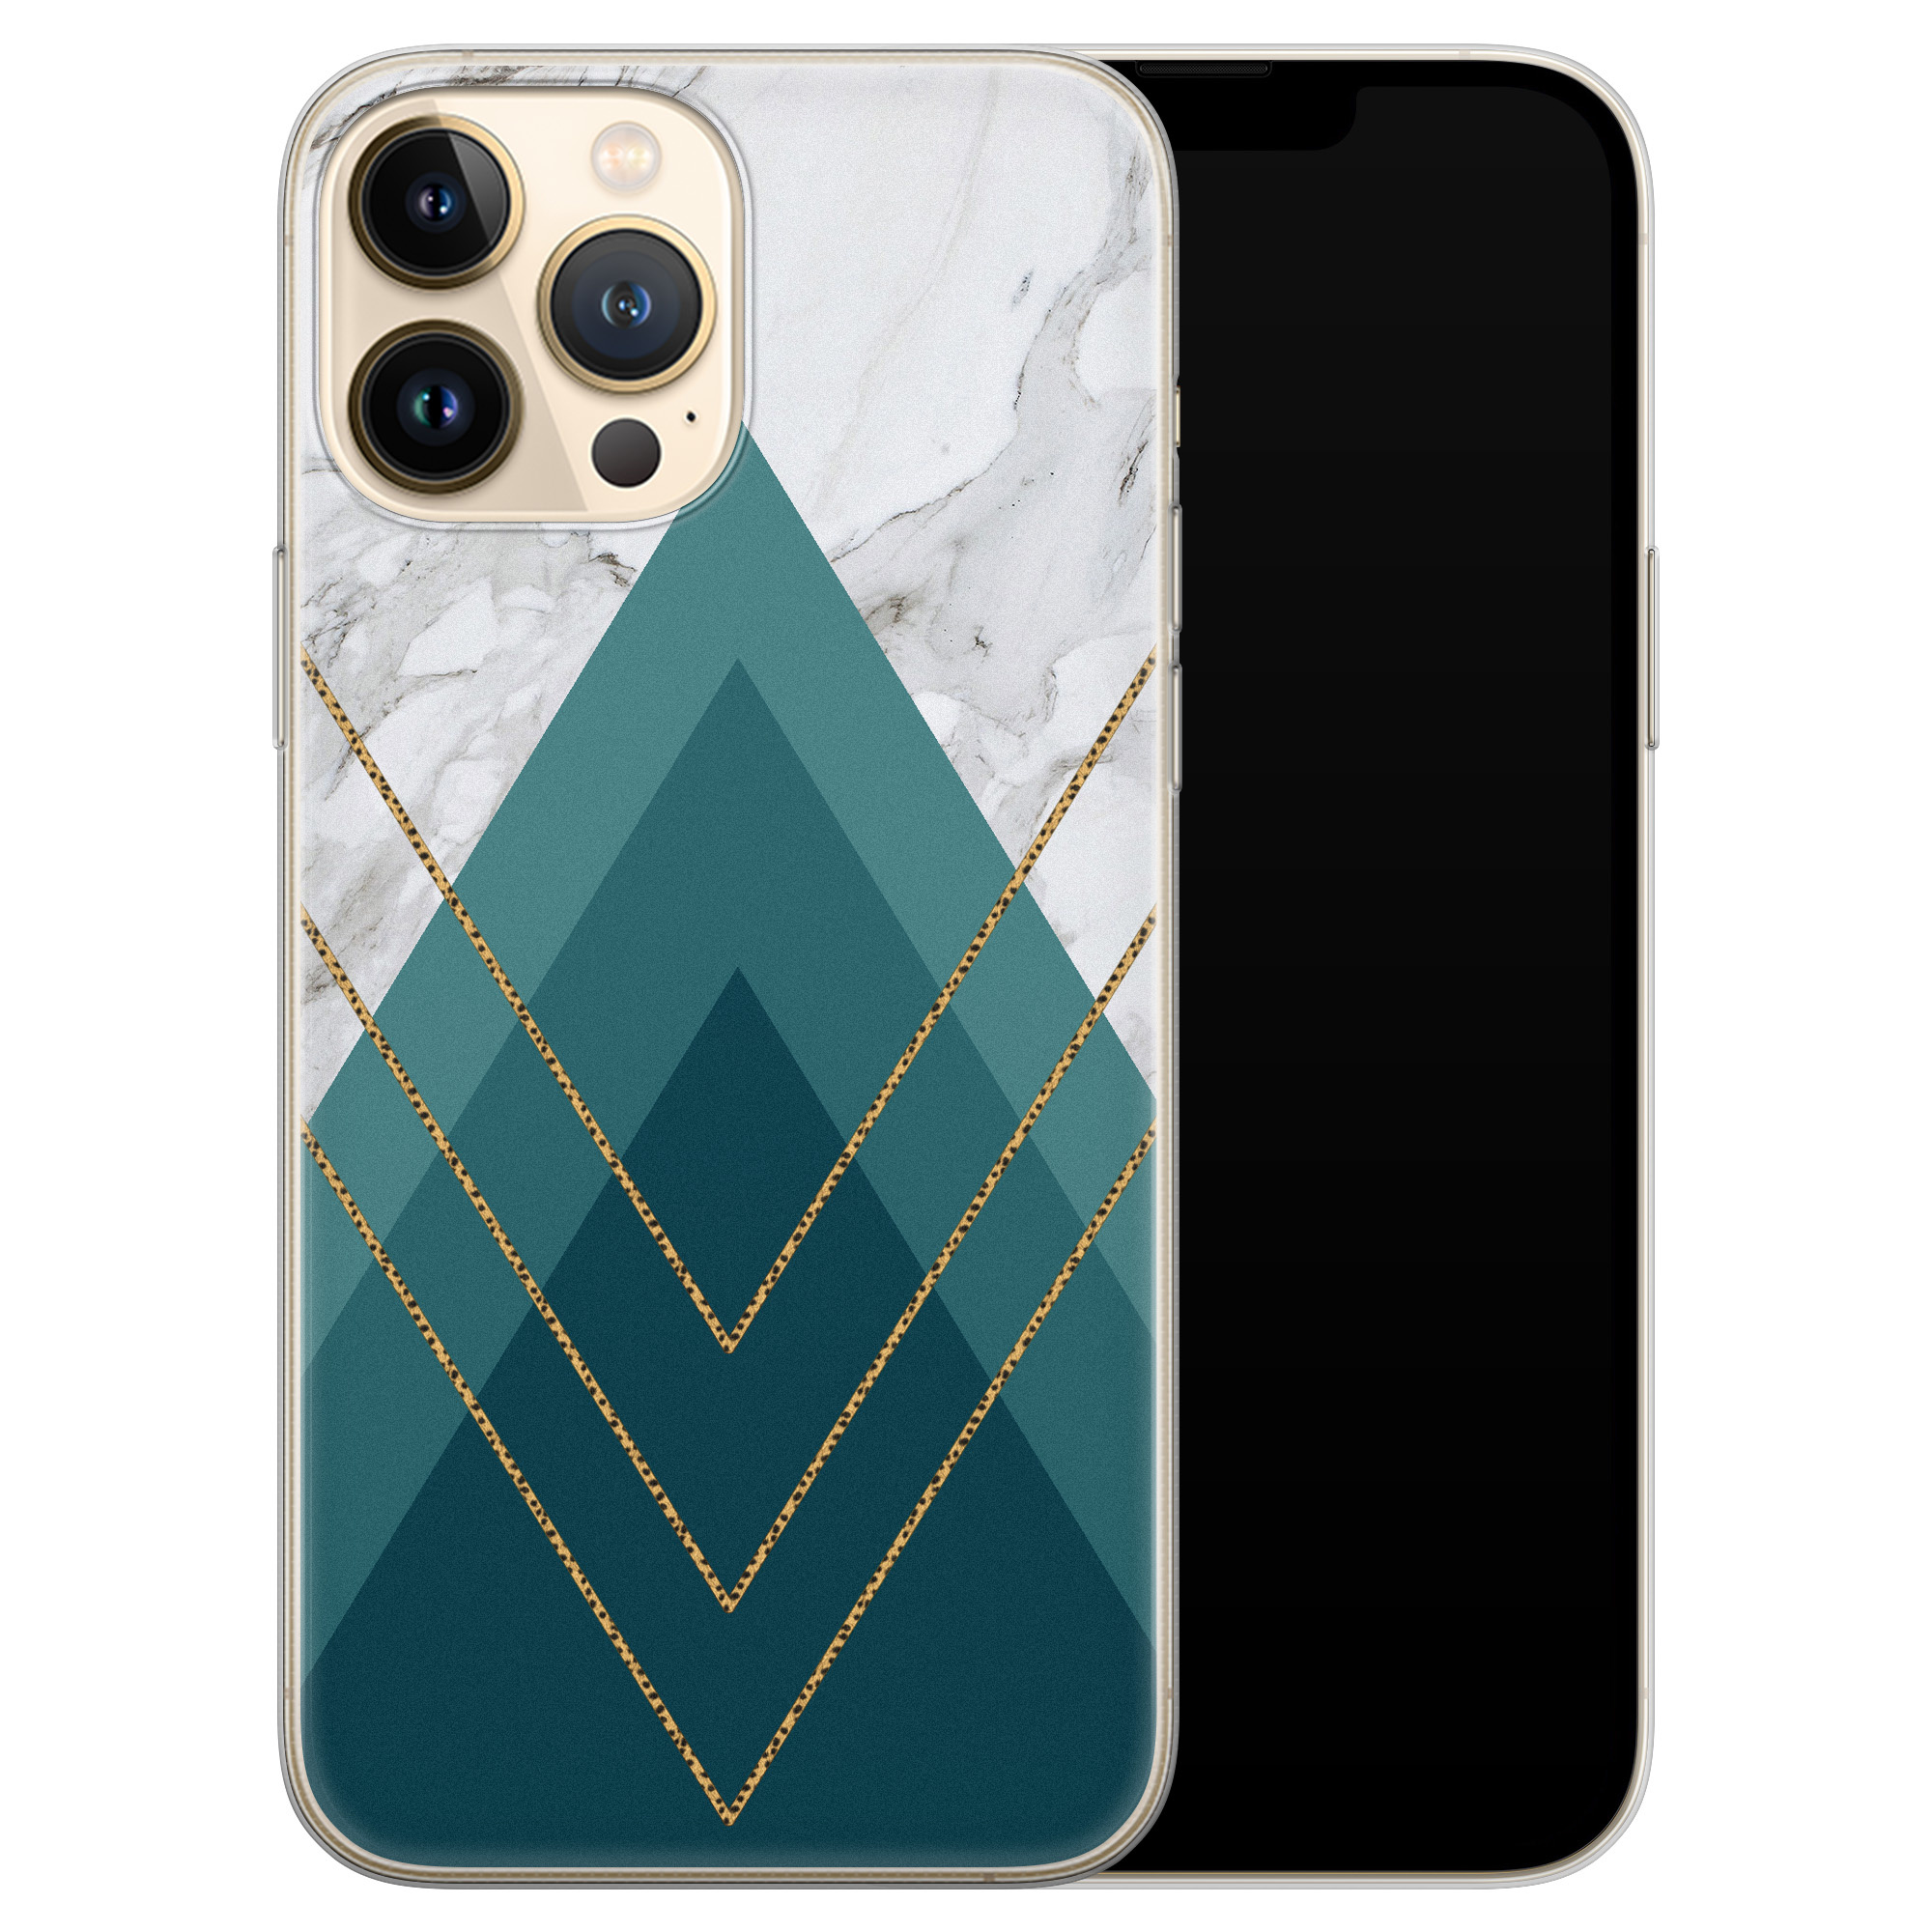 Leuke Telefoonhoesjes iPhone 13 Pro Max siliconen hoesje - Geometrisch blauw